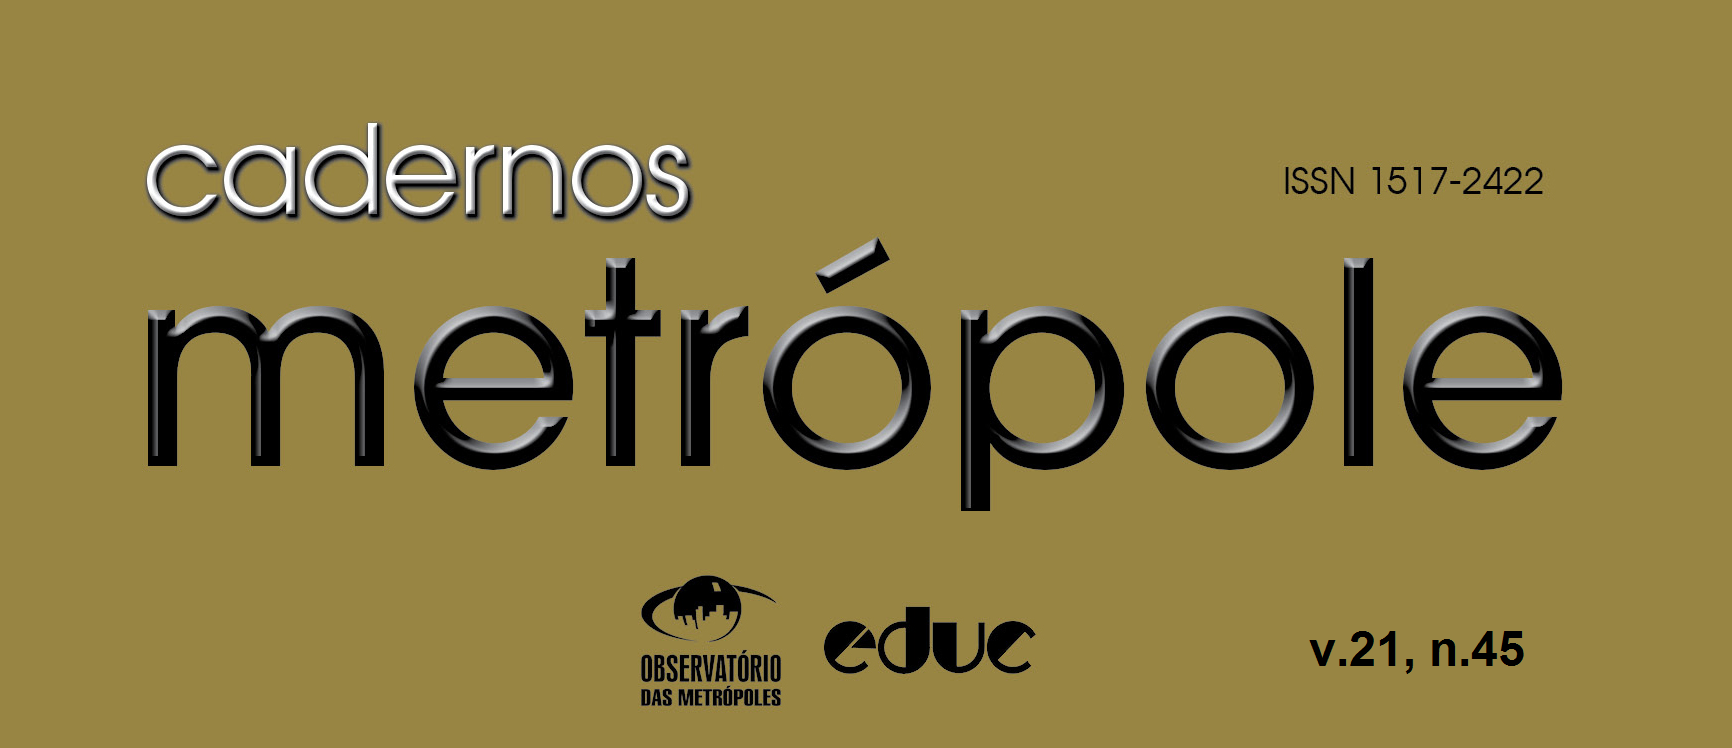 Está disponível o novo número da Revista Cadernos Metrópole (n.45)